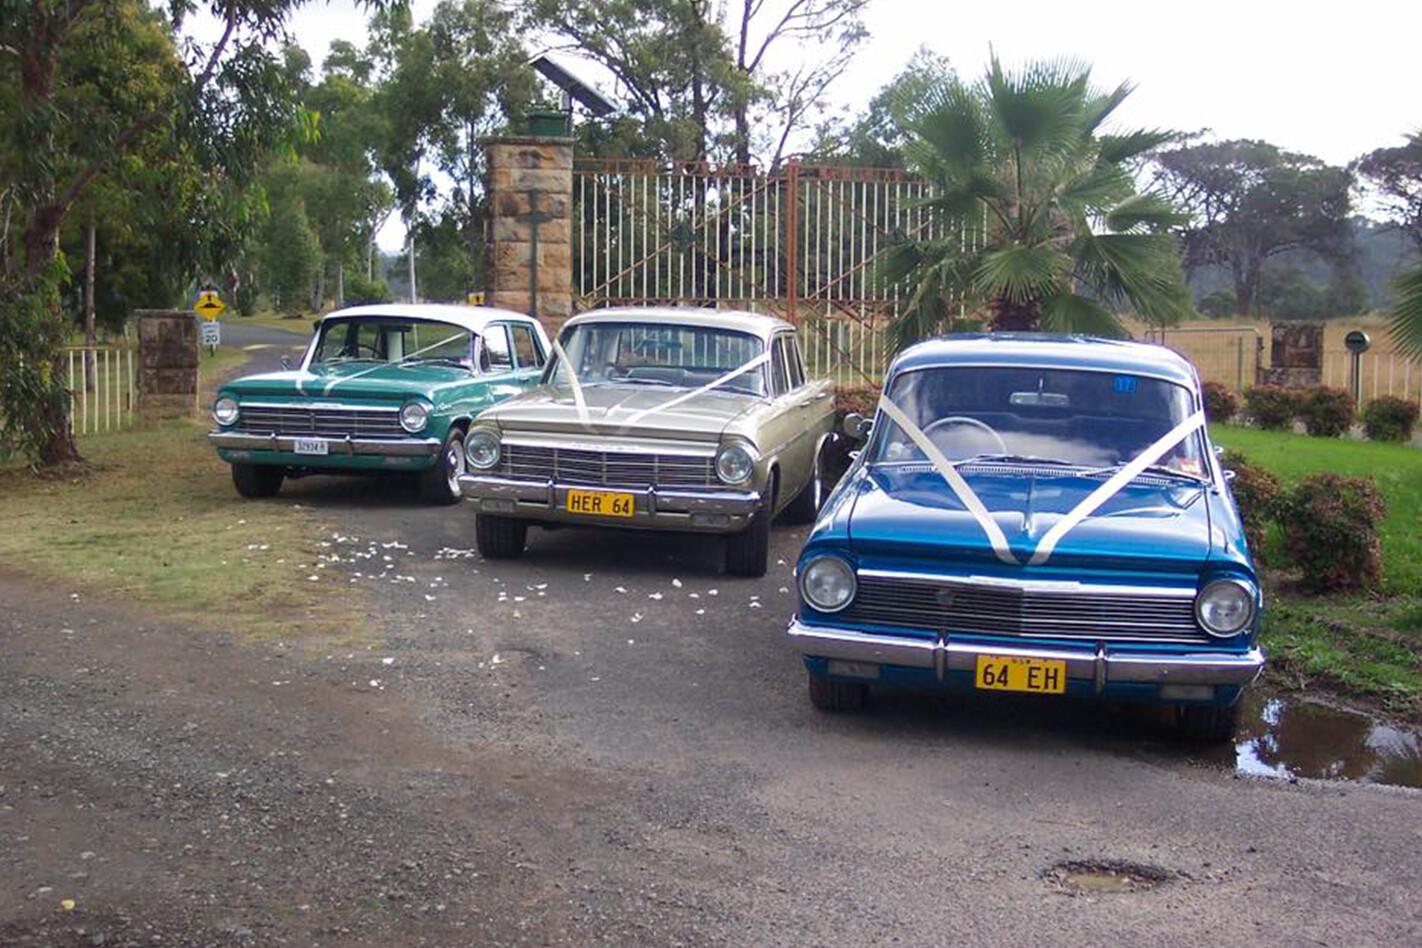 Wes Bracken's Holden wedding cars